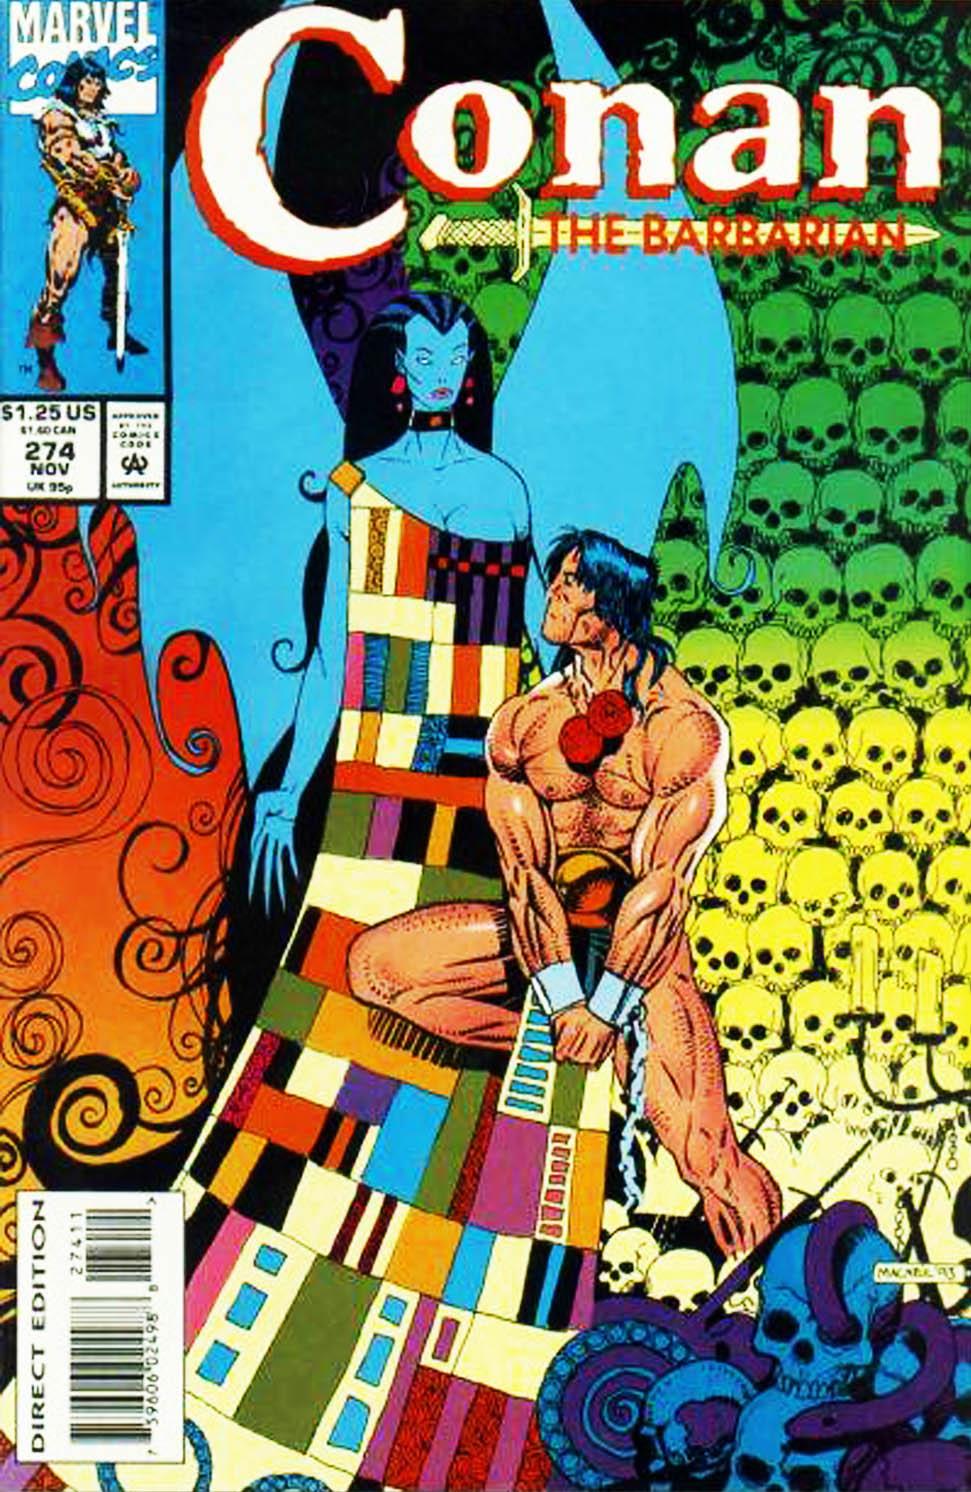 Conan the Barbarian 274